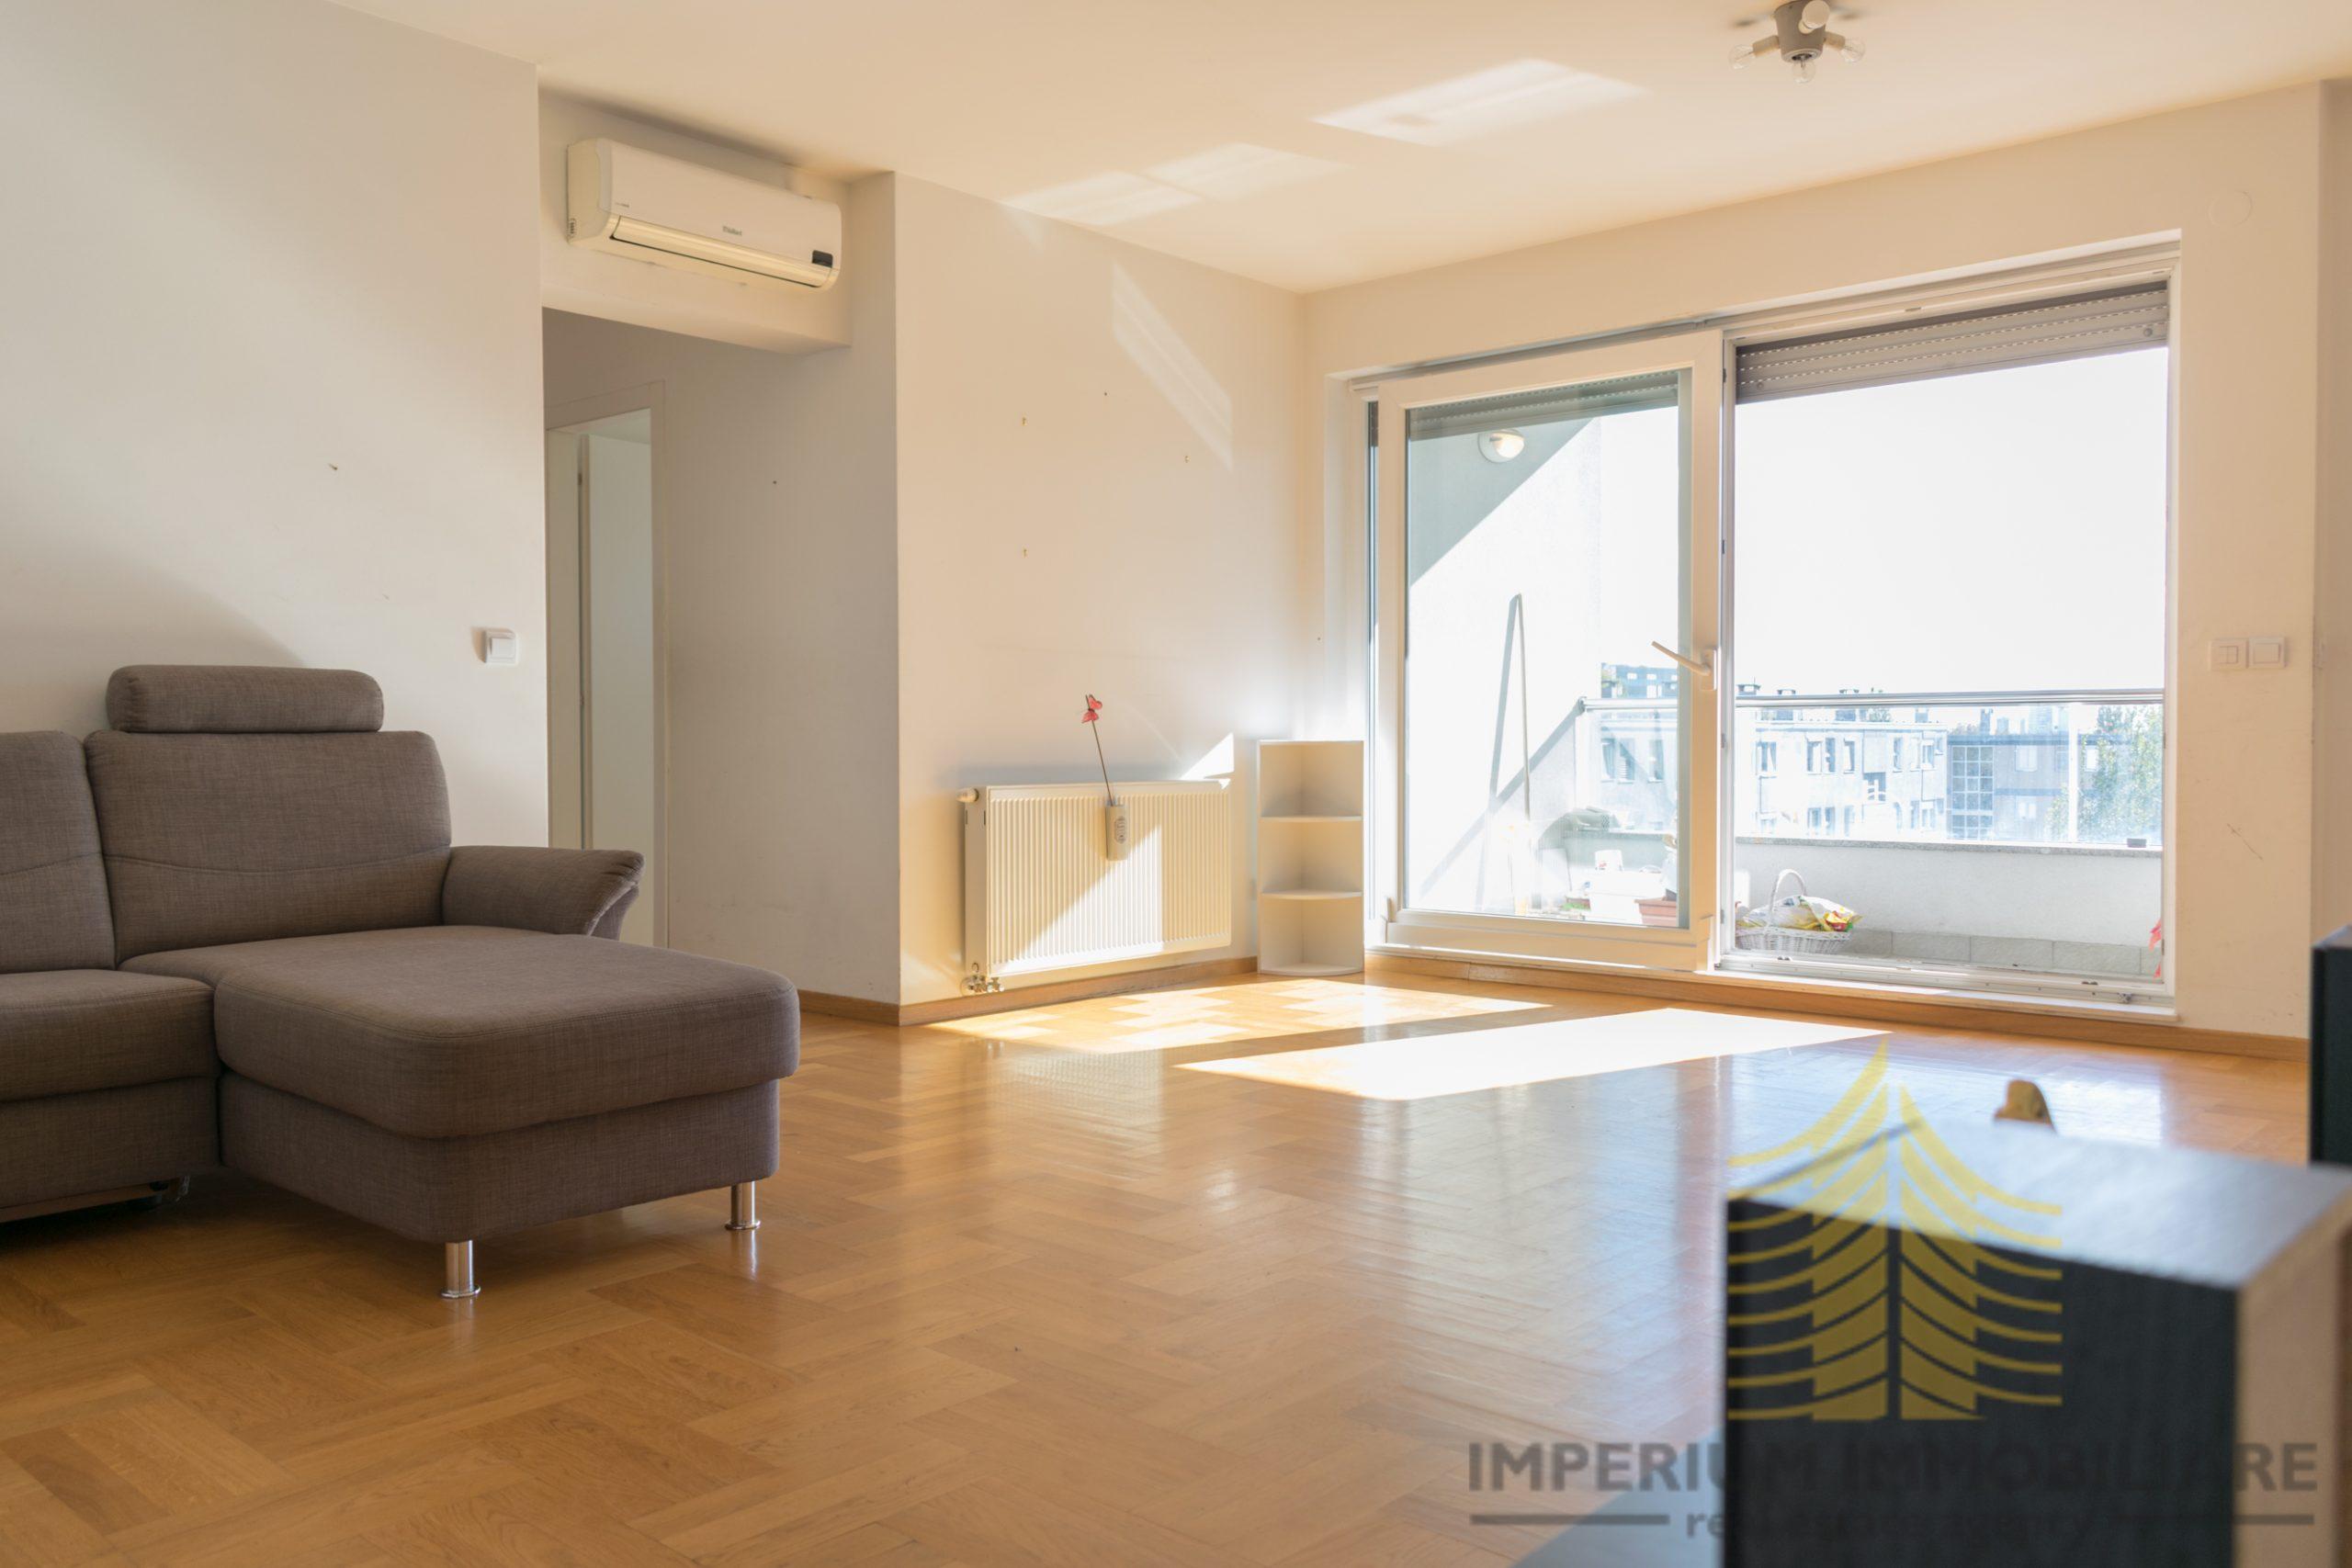 Stan: Zagreb (Črnomerec), 110 m2 , LUX.UREĐEN , BLIZINA CENTRA